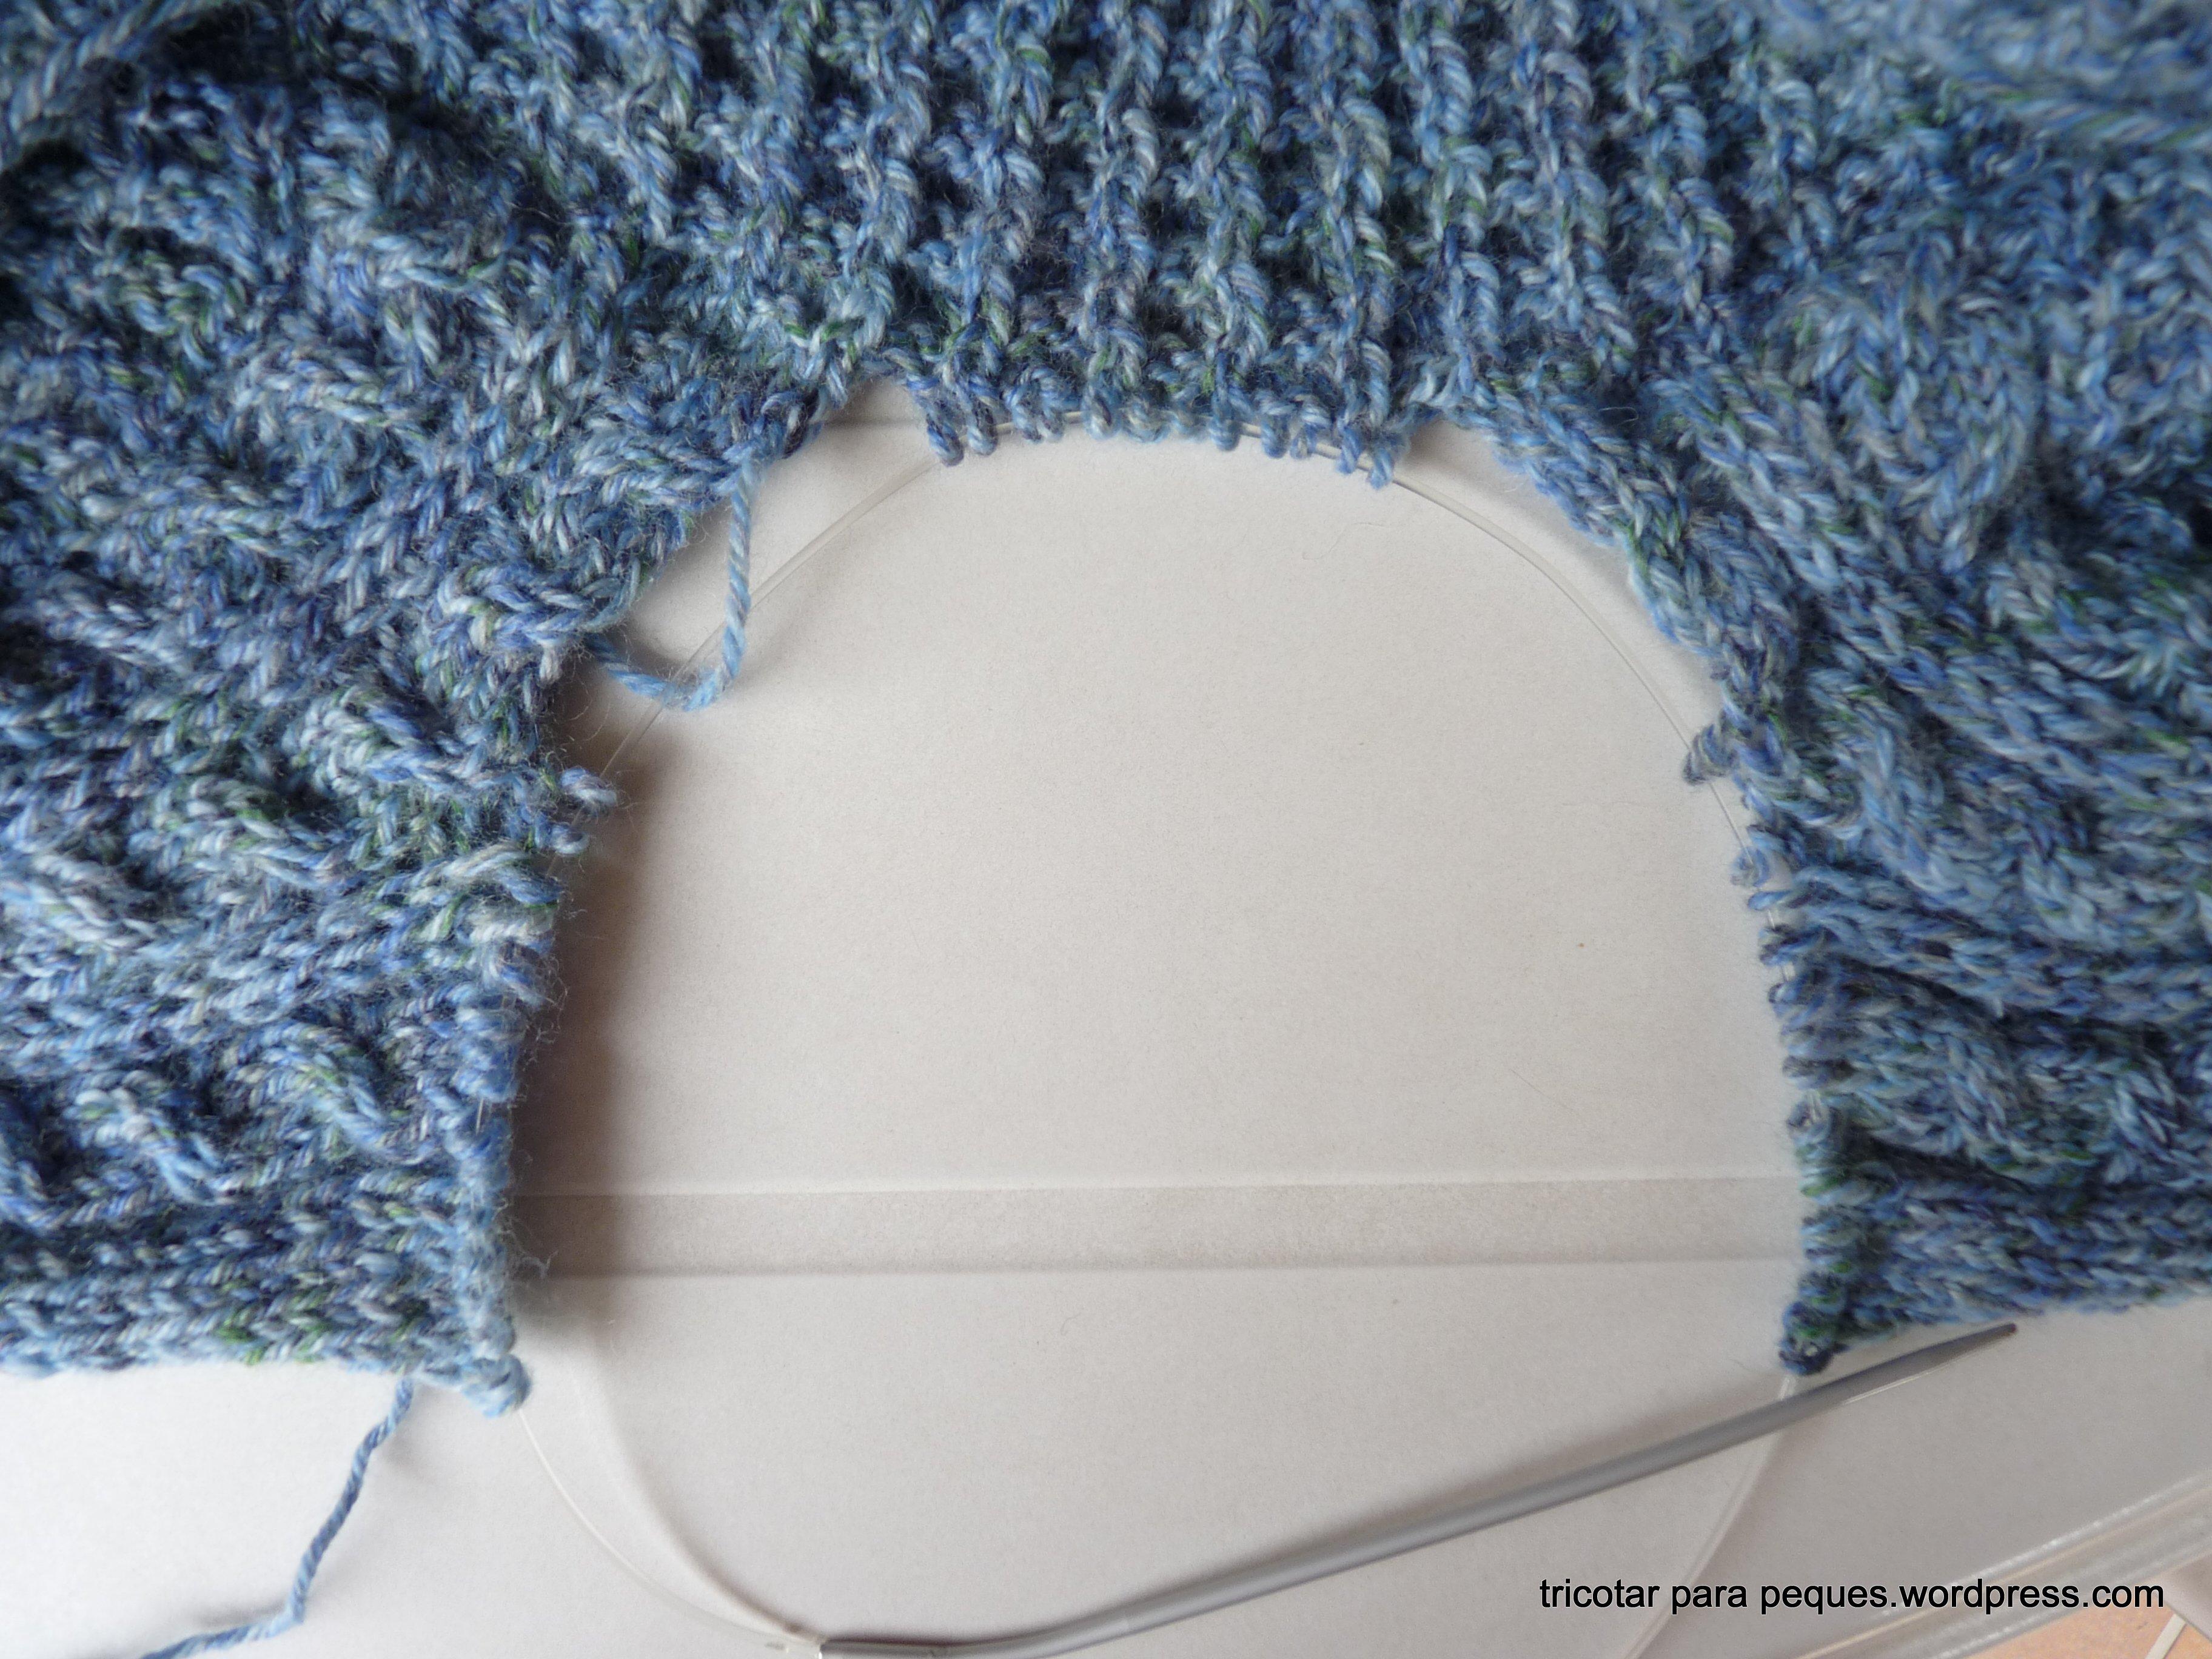 mvalls5   Tricotar para peques - Knitting for kids   Página 4